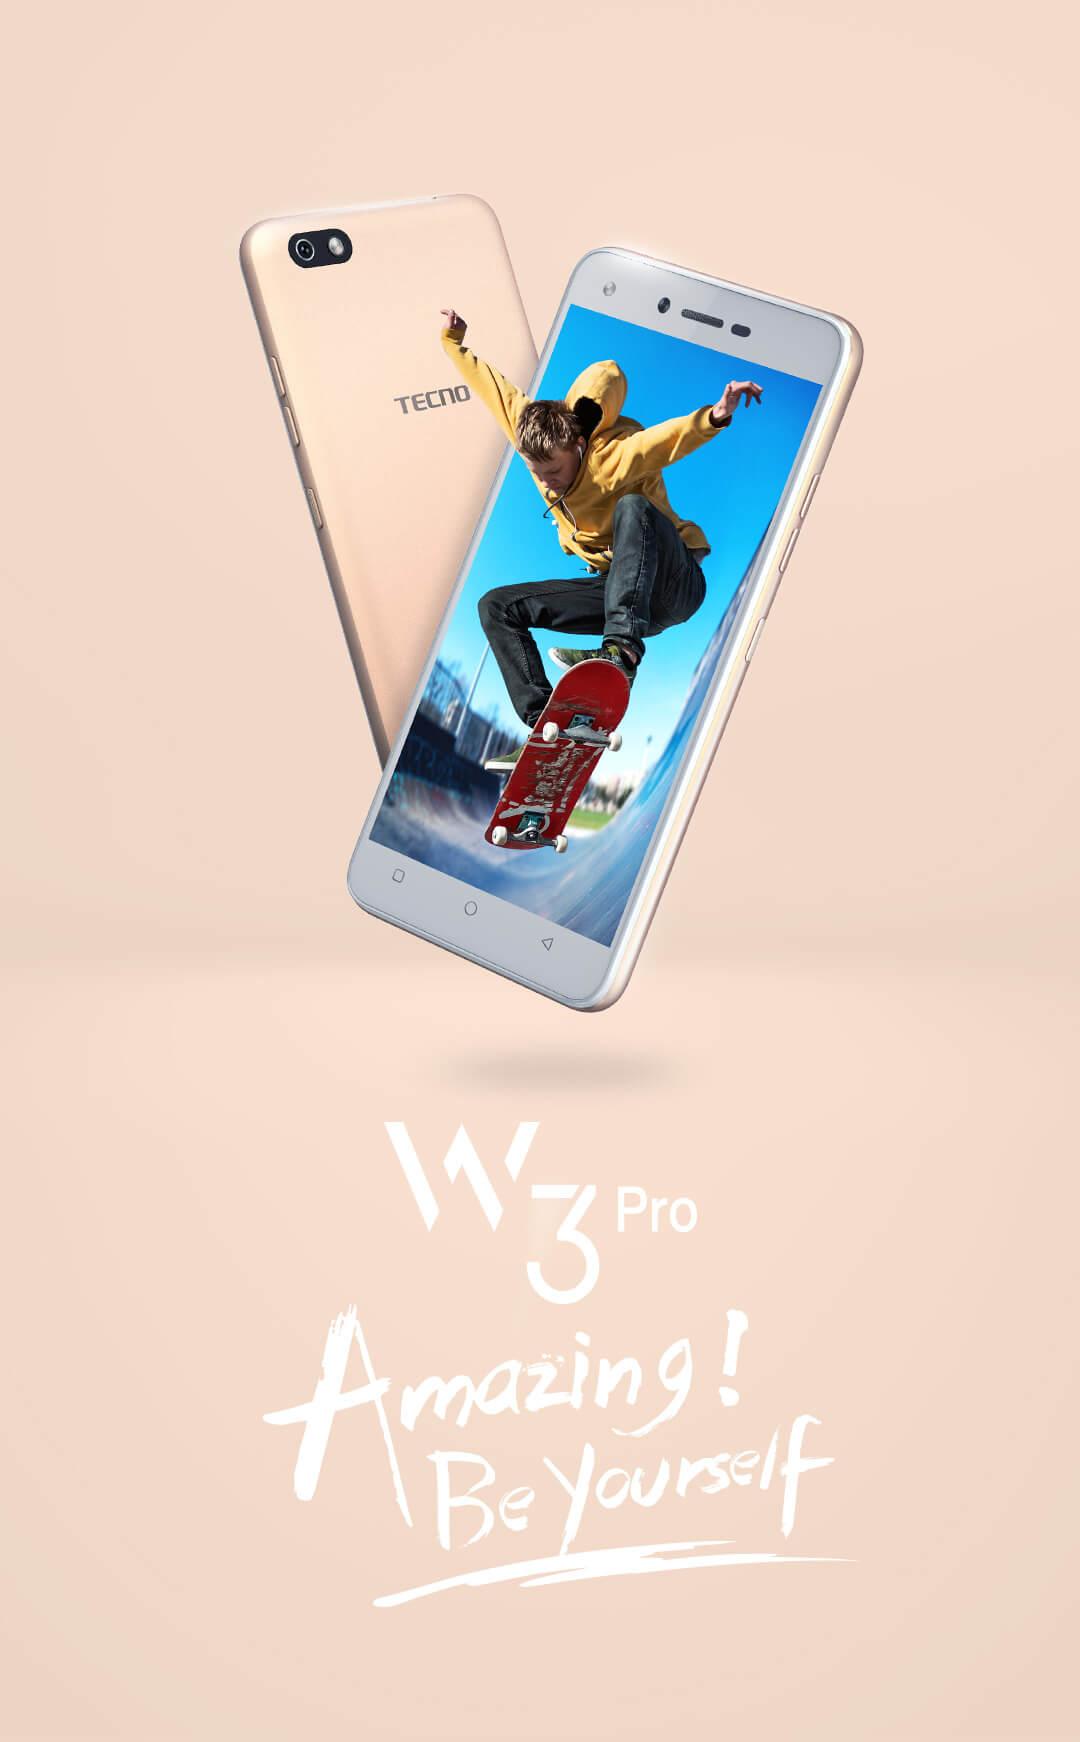 W3 Pro - TECNO Mobile